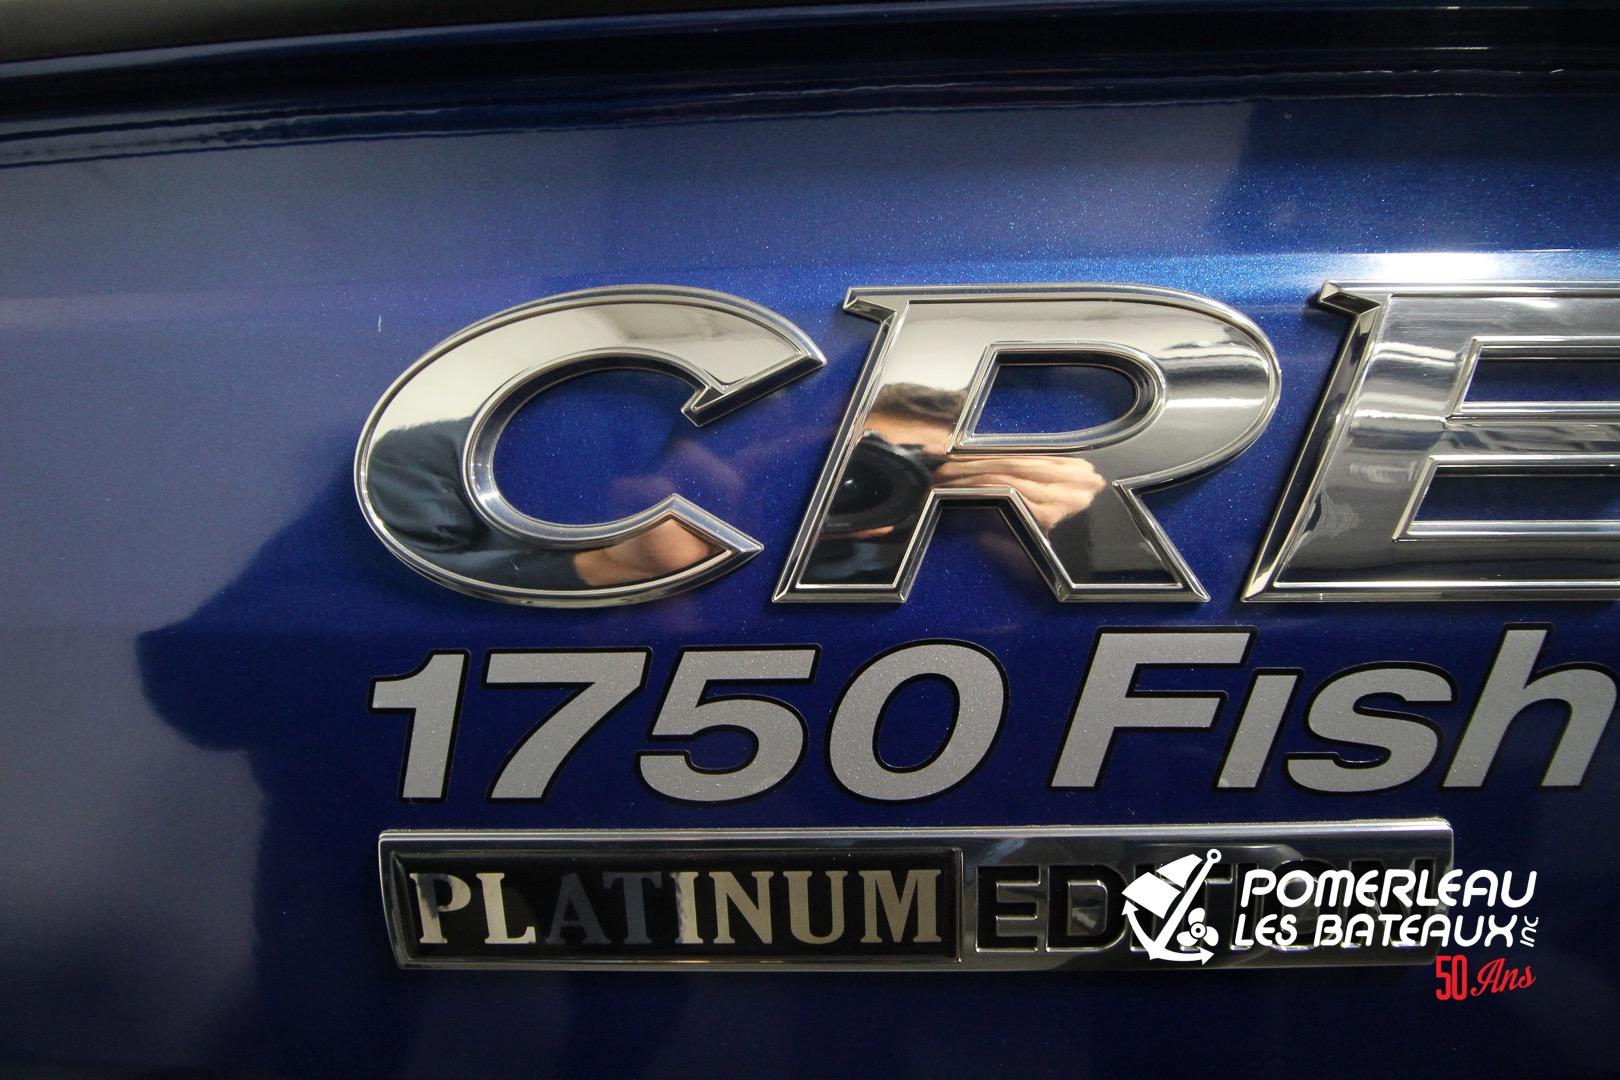 Crestliner FIsh hawk 1750 - IMG_6645